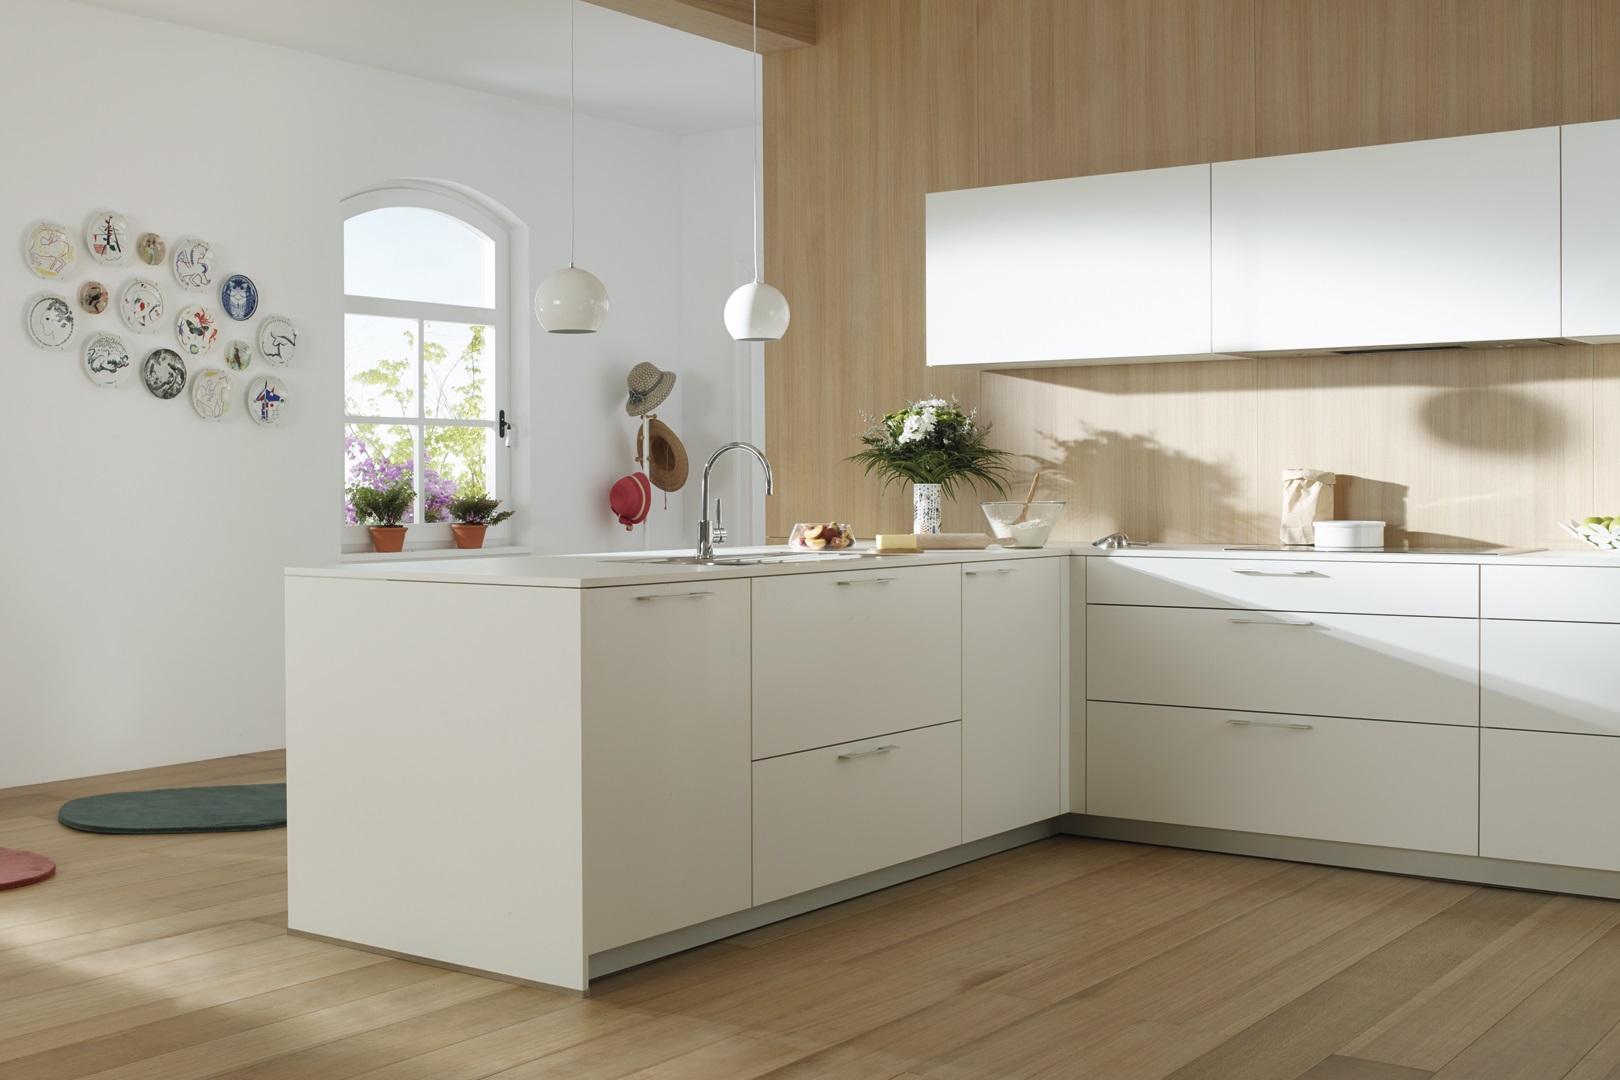 Cocina blanca con pared en madera Santos